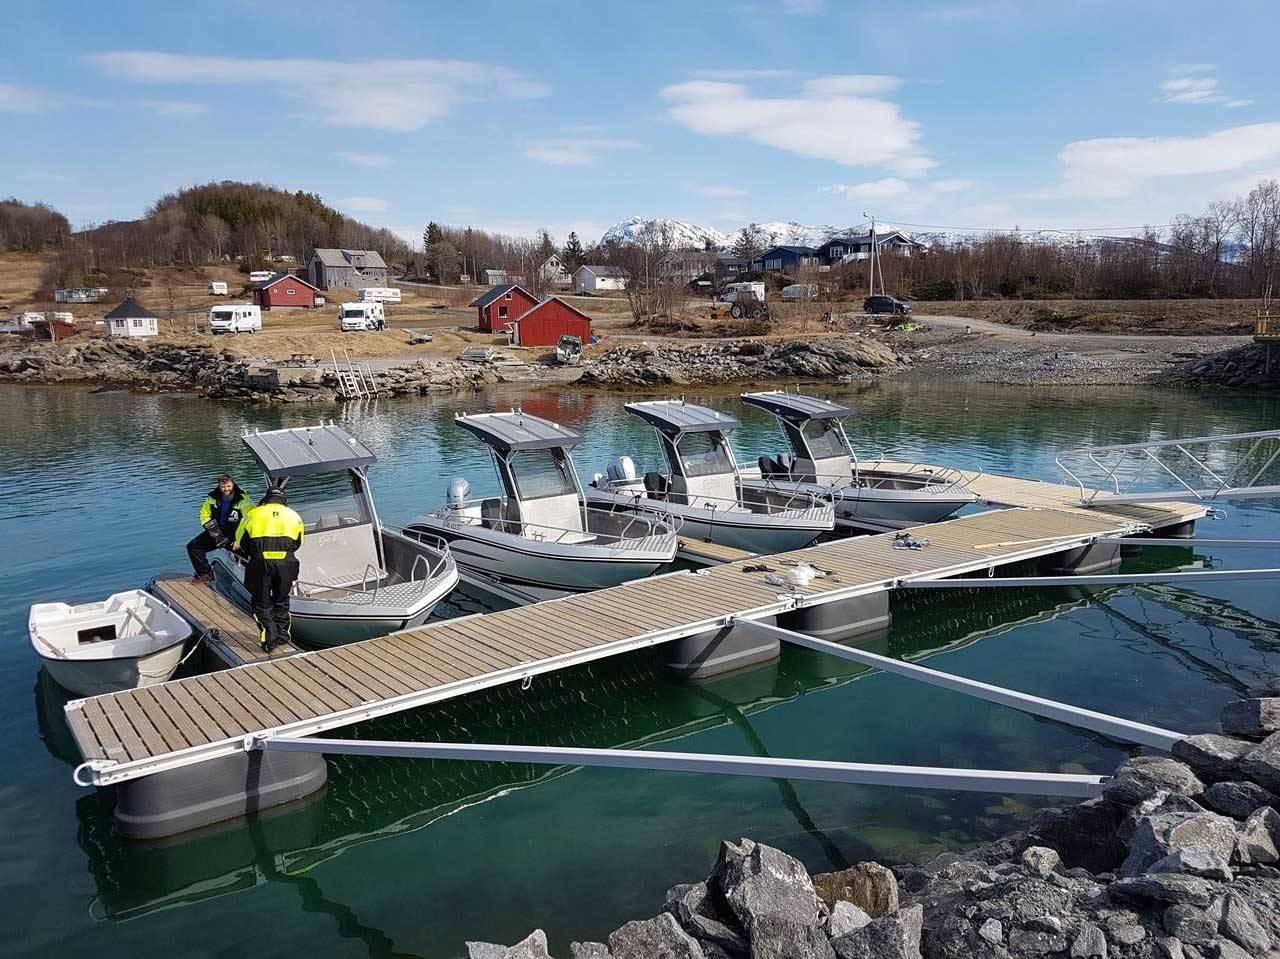 Båtutleie / Boat rental